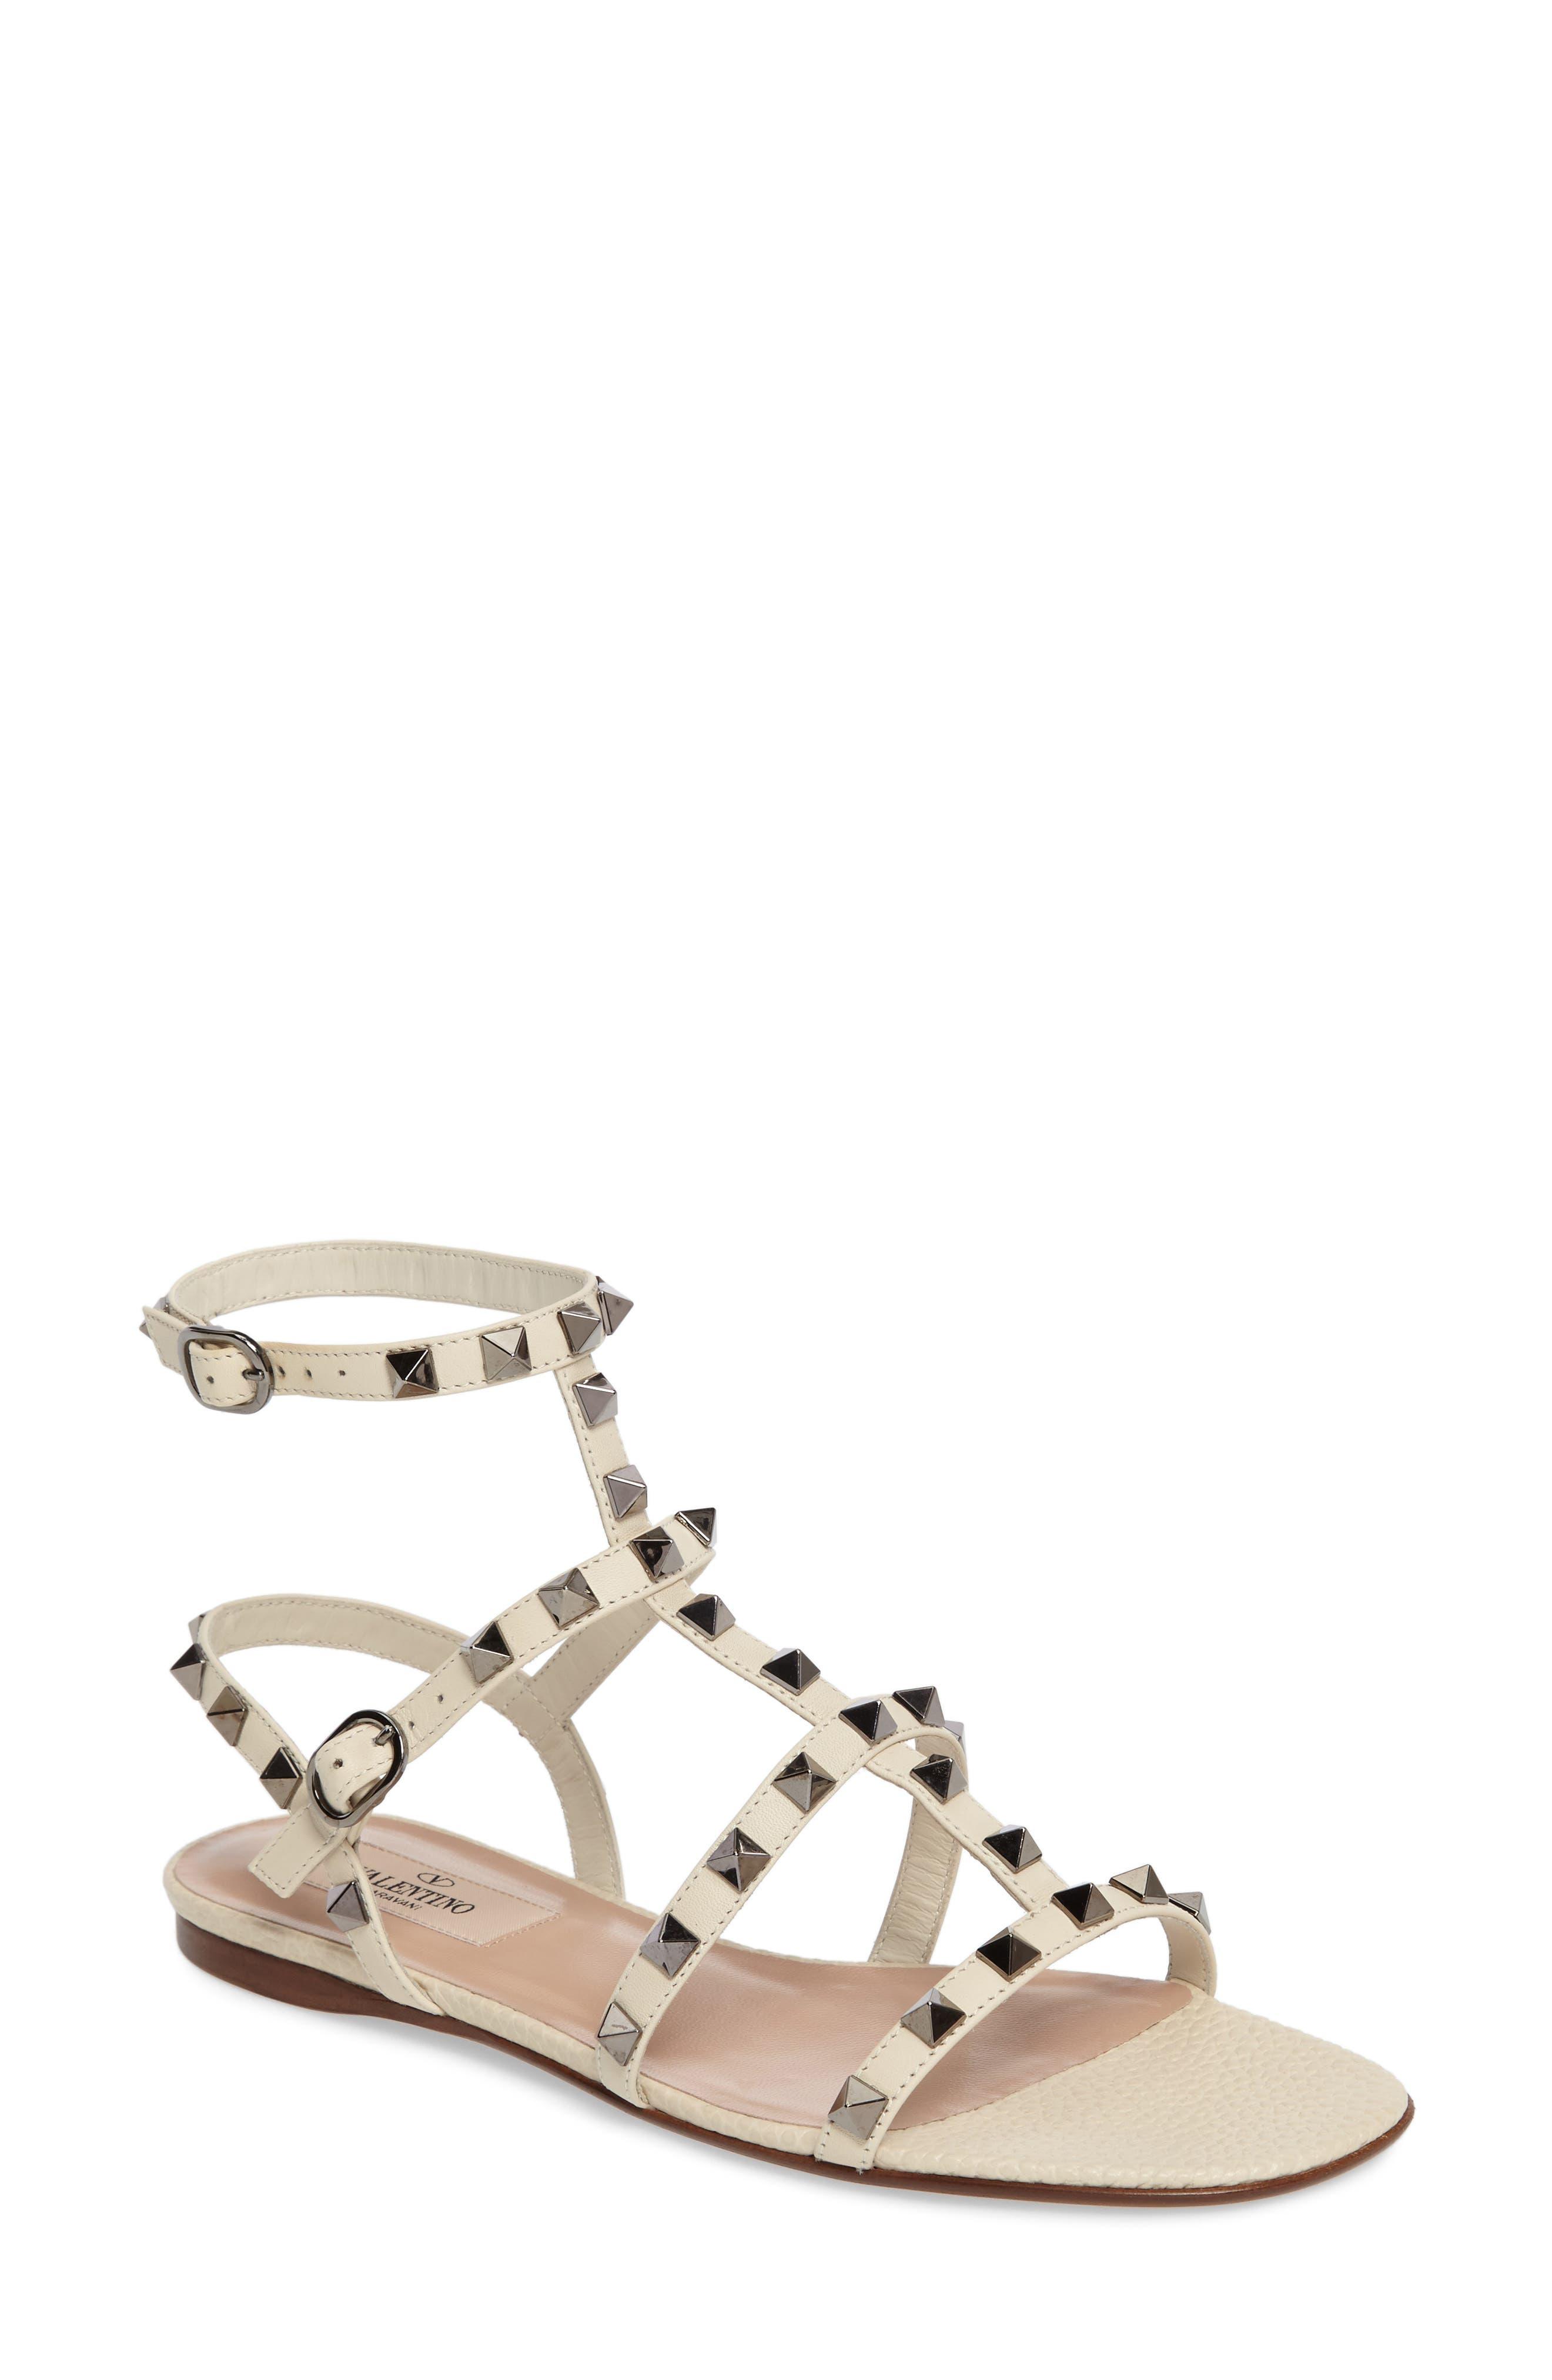 Main Image - Valentino Rockstud Gladiator Sandal (Women)